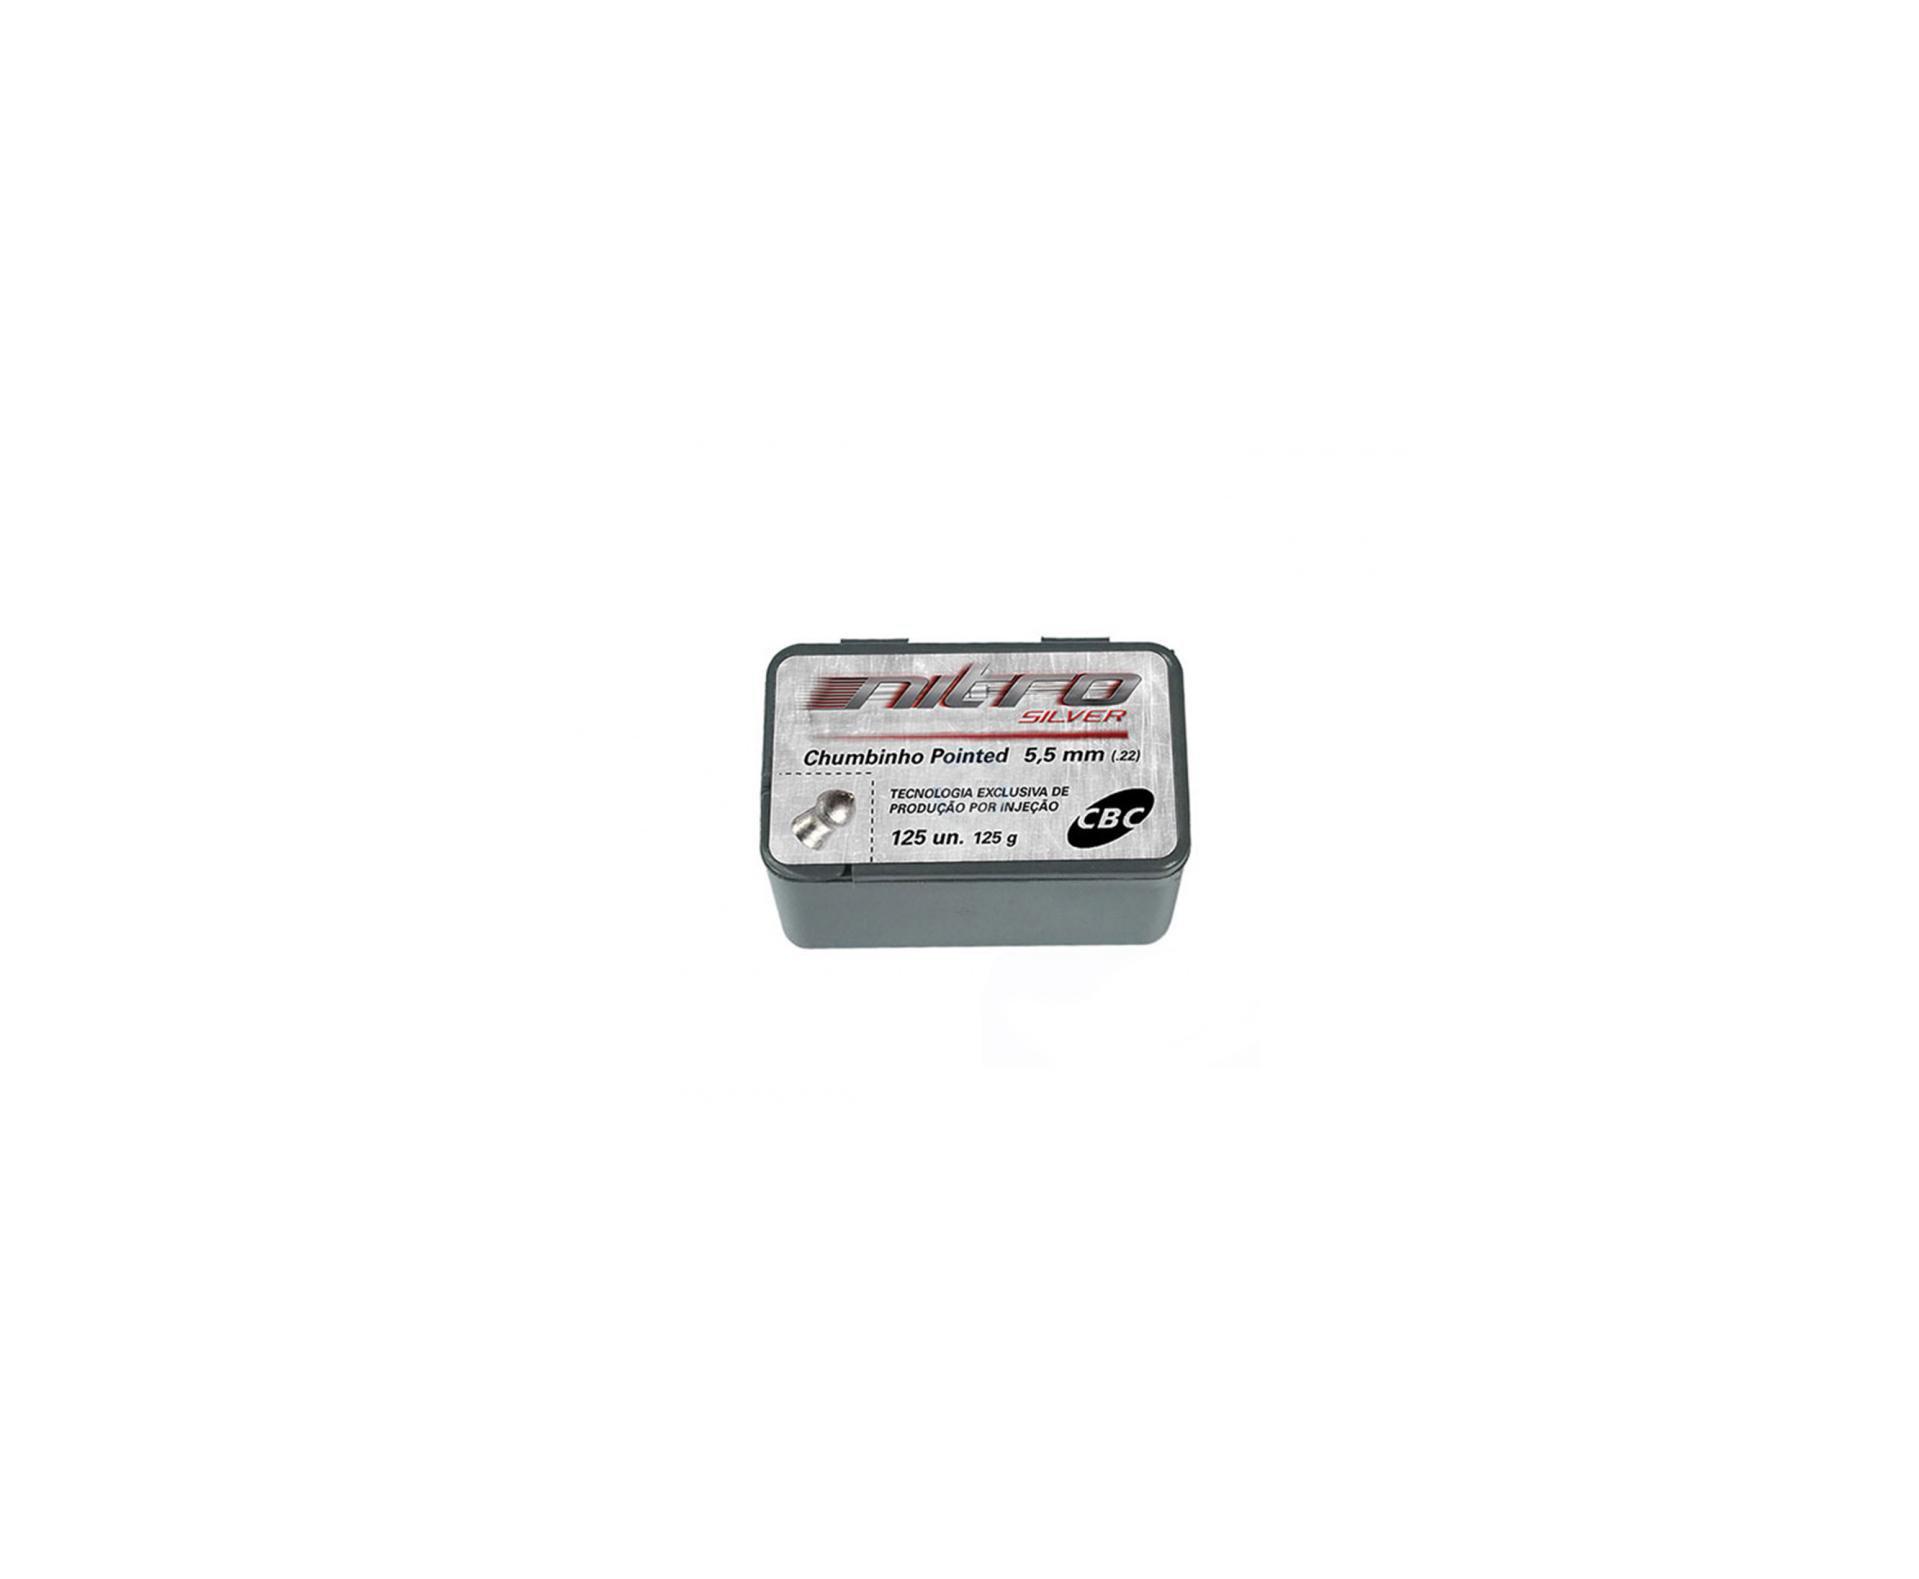 Chumbinho Cbc Nitro Silver Pointed 5,5mm Com 125und